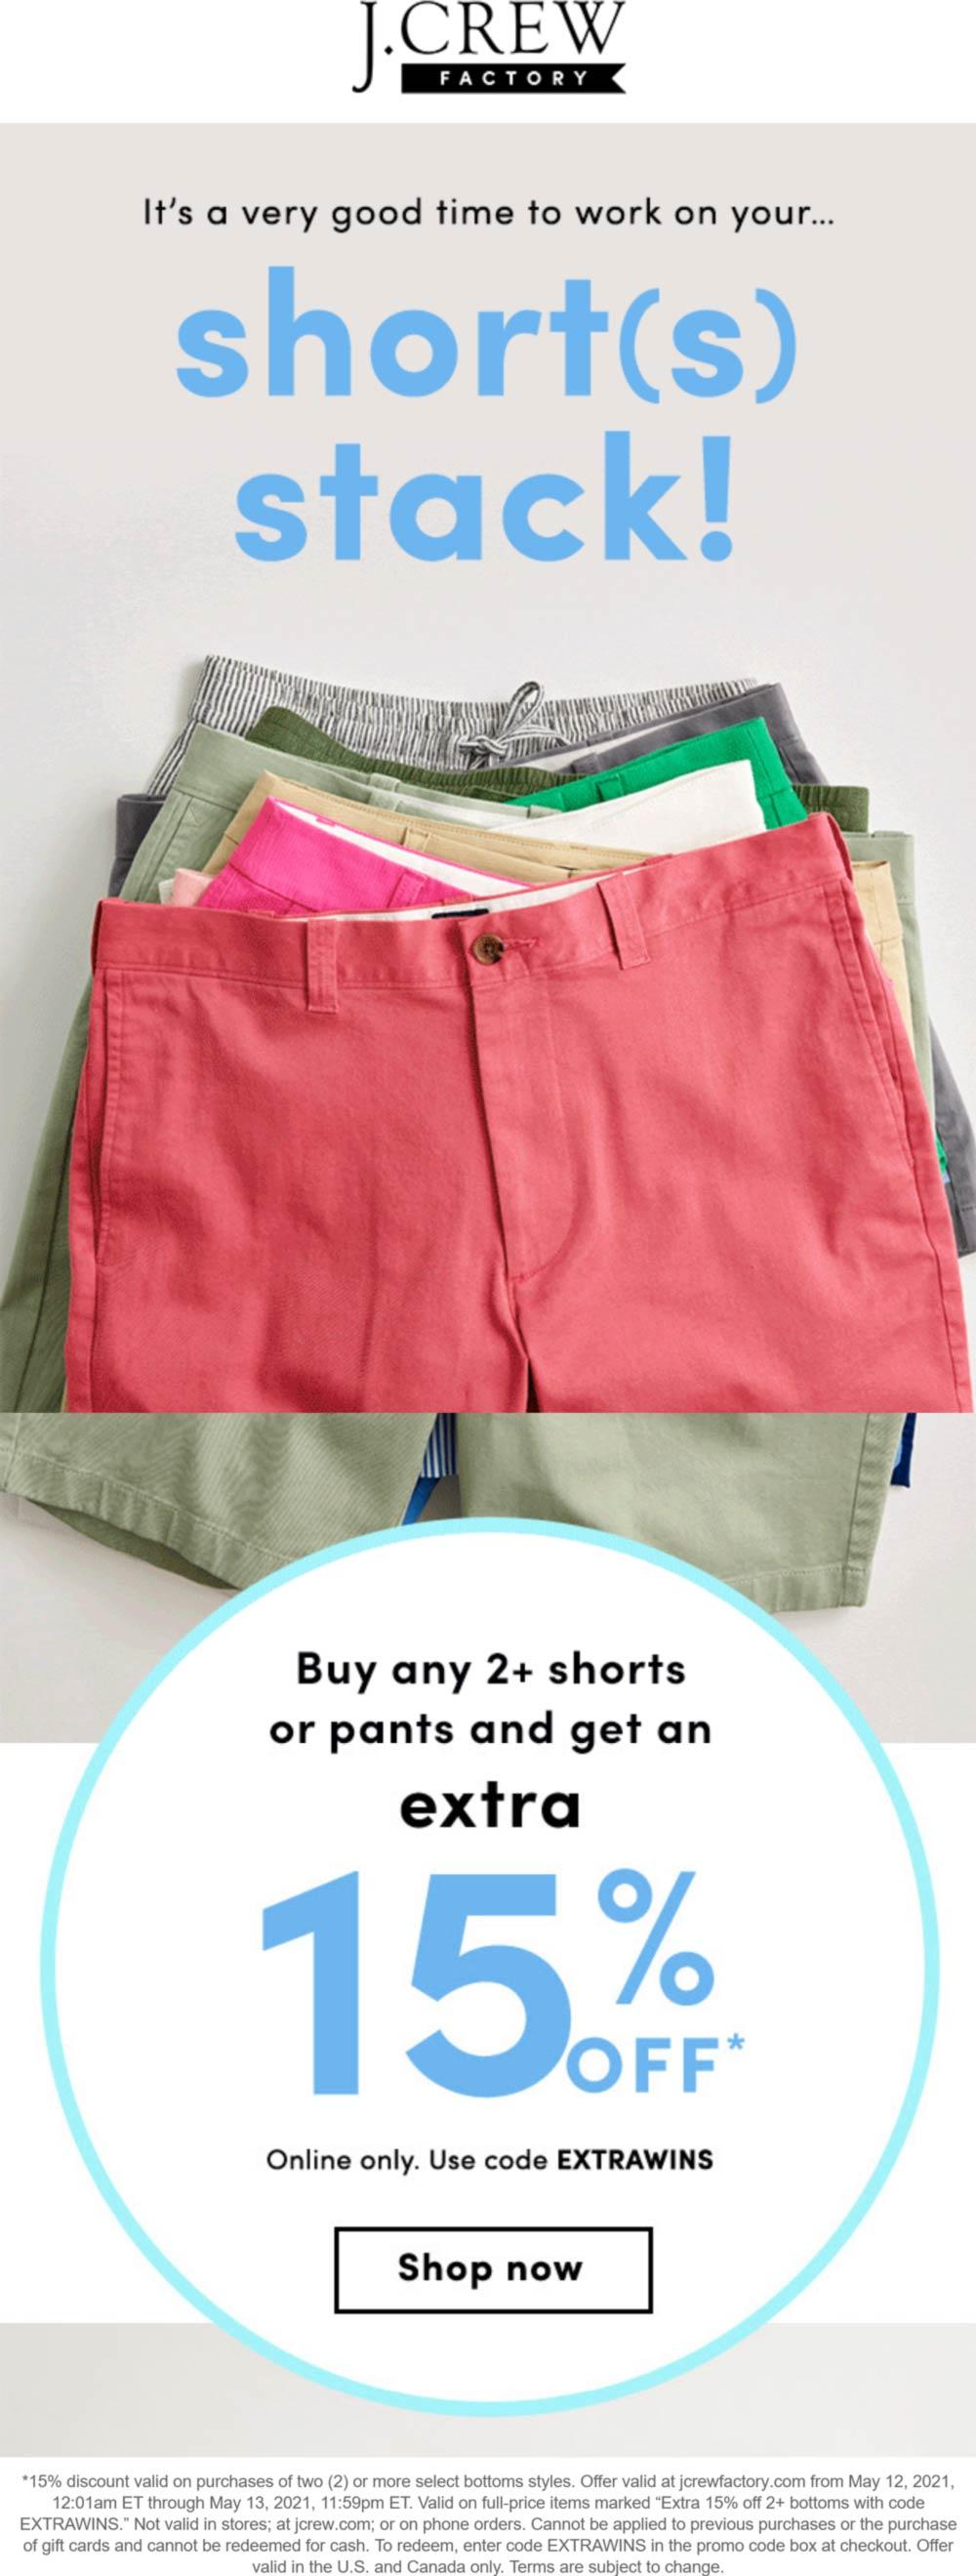 J.Crew Factory stores Coupon  15% off 2+ pair shorts or pants at J.Crew Factory via promo code EXTRAWINS #jcrewfactory